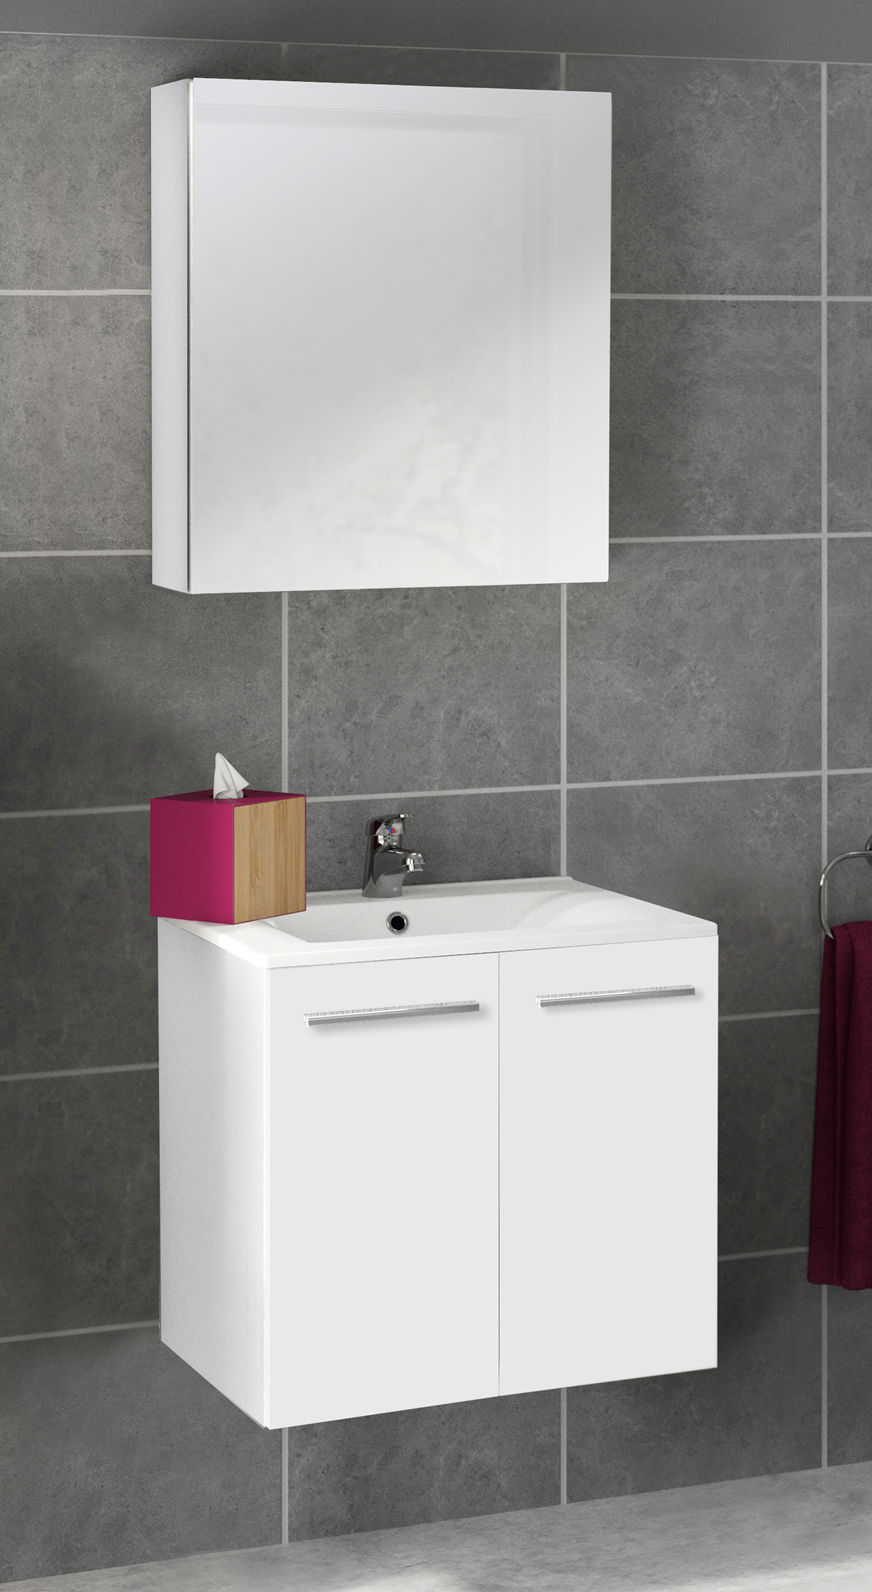 meuble sous vasque 2 portes 60 cm srie adesio 3. Black Bedroom Furniture Sets. Home Design Ideas